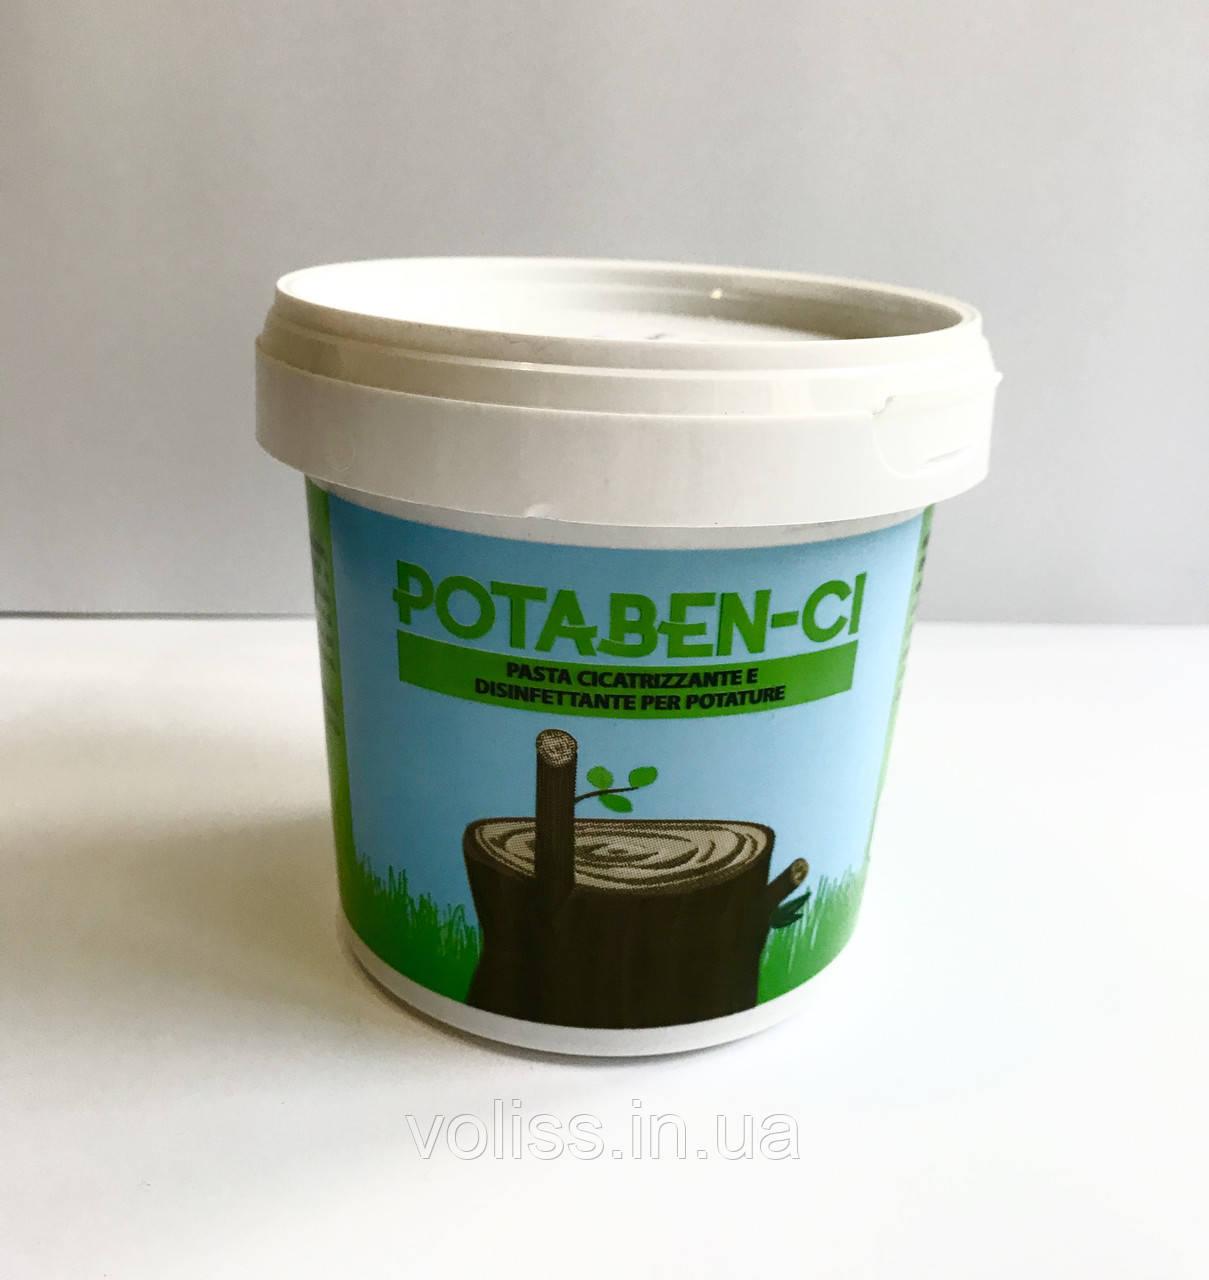 Паста при обрізанні Potaben Сі, 0,5 кг